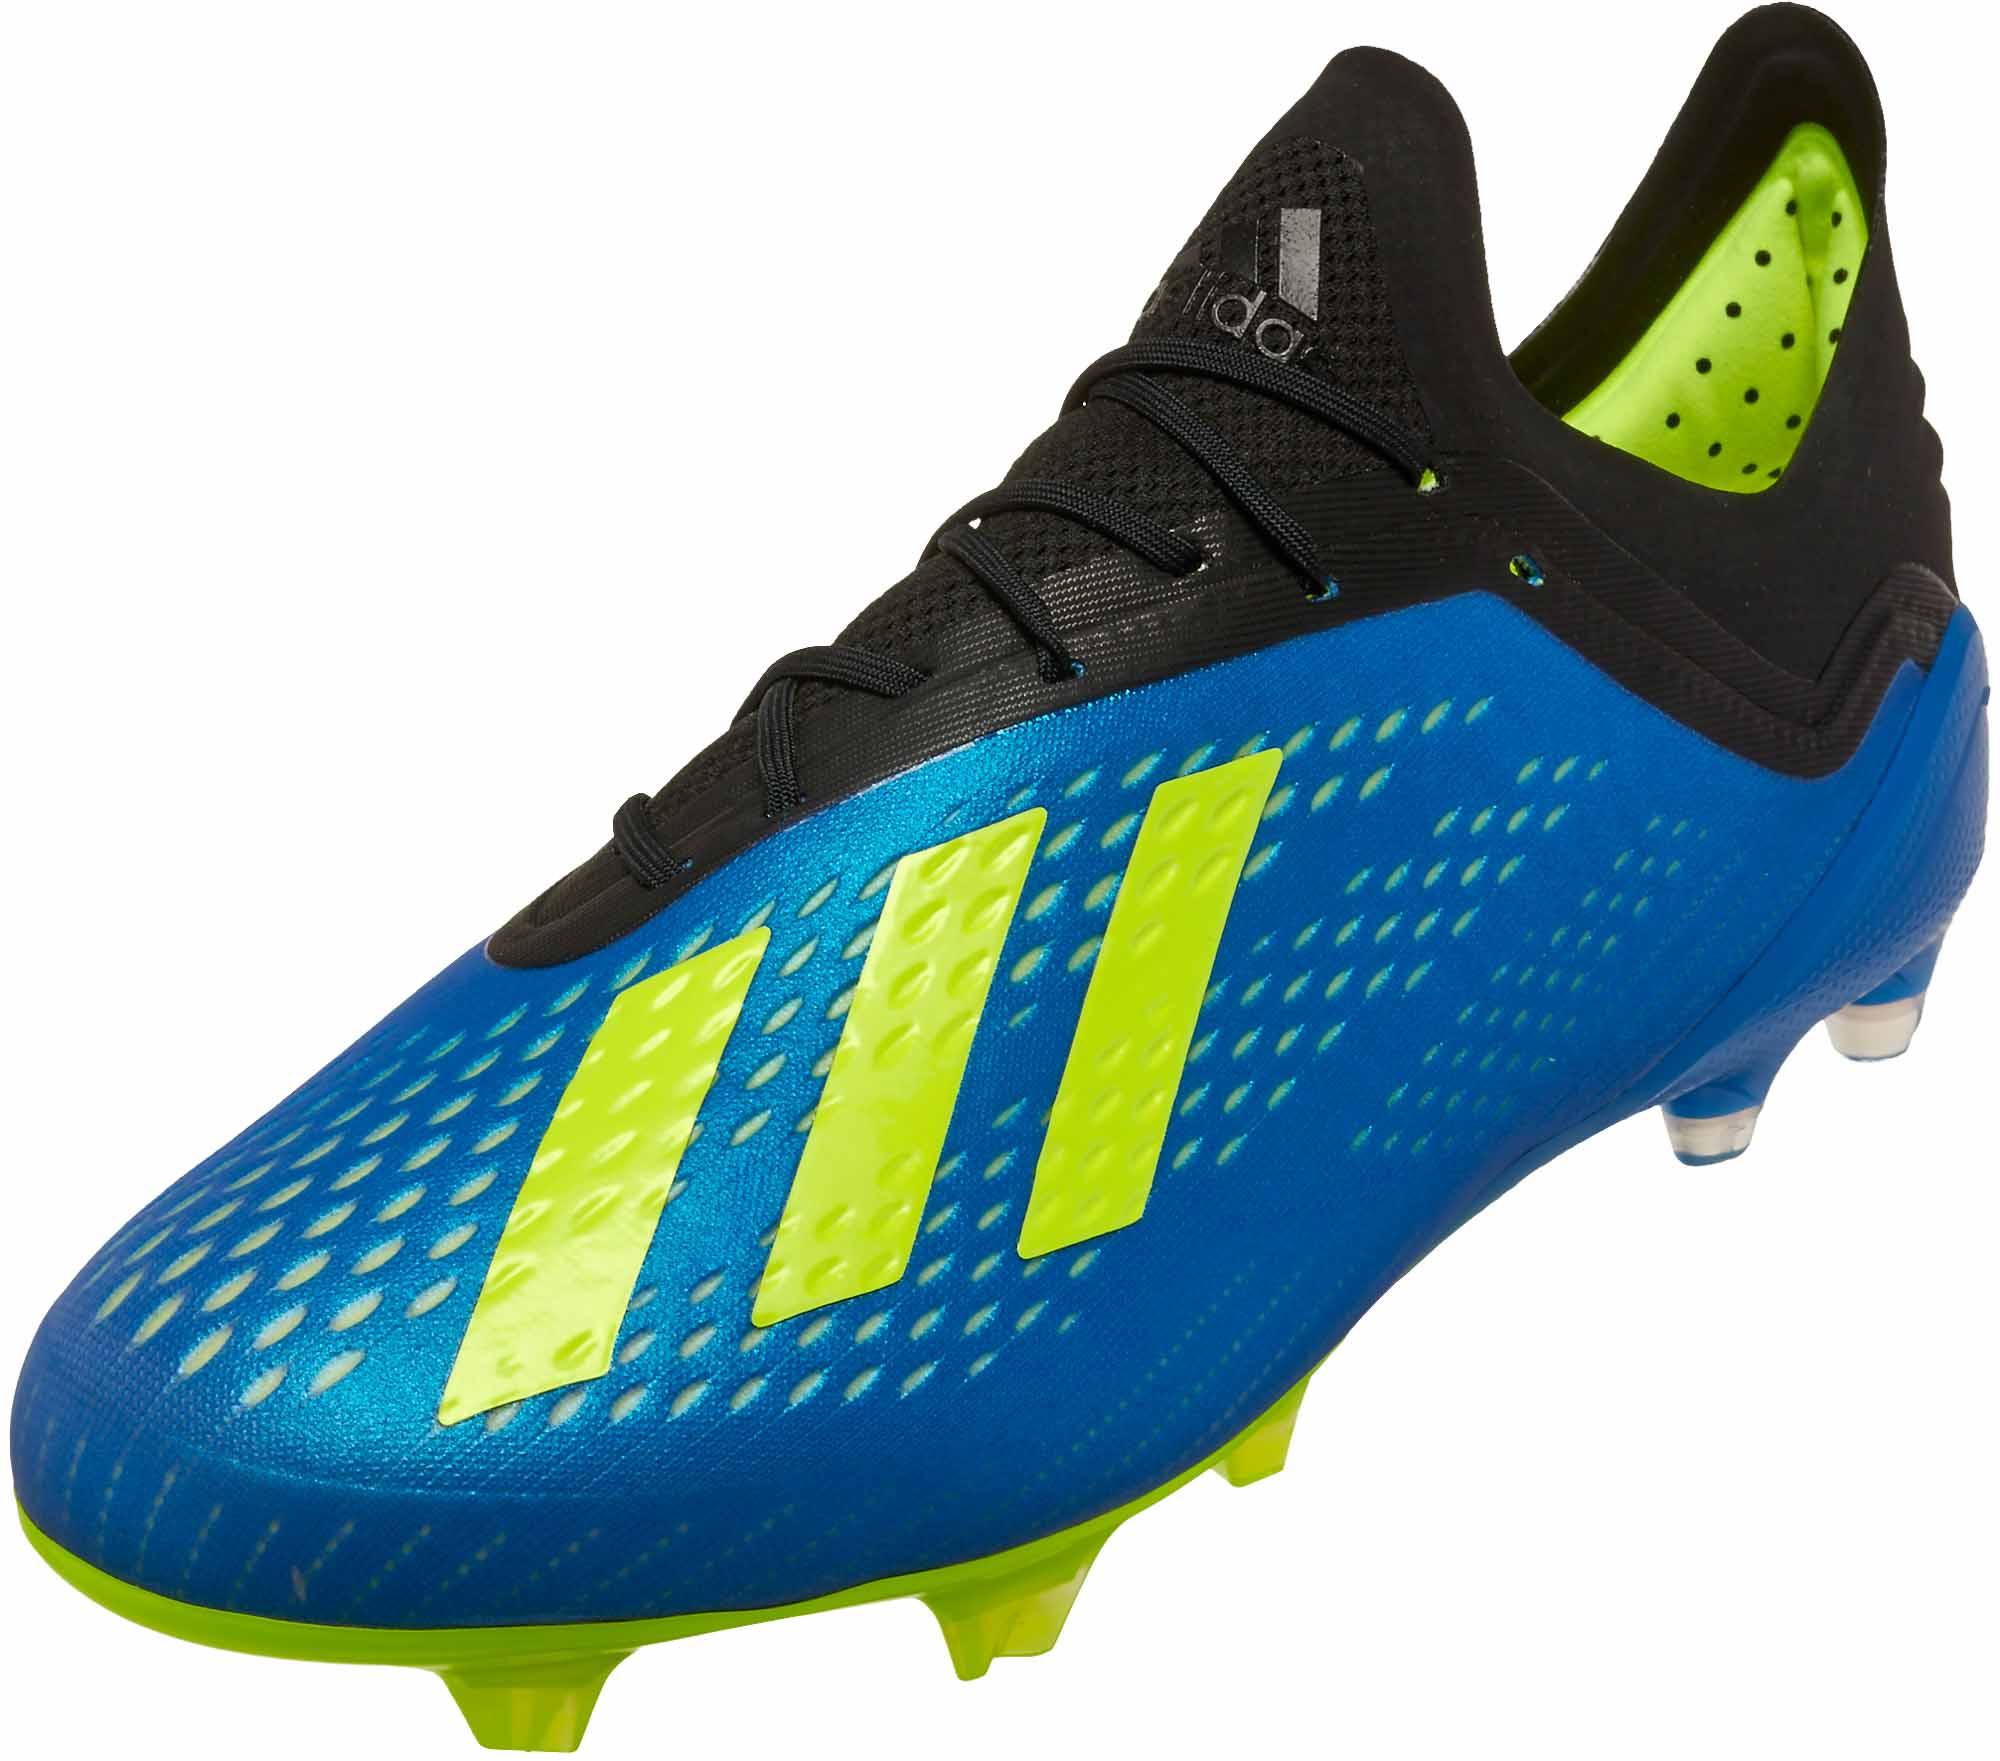 wholesale dealer d5d96 4195e adidas X 18.1 FG – Football Blue Solar Yellow